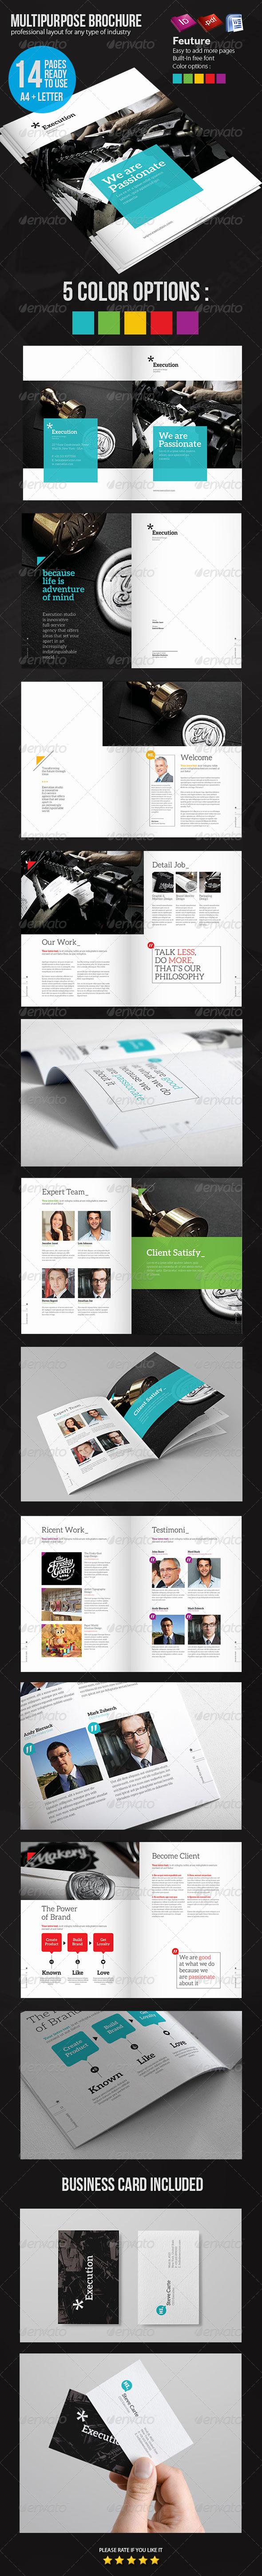 GraphicRiver Business Brochure 4980239